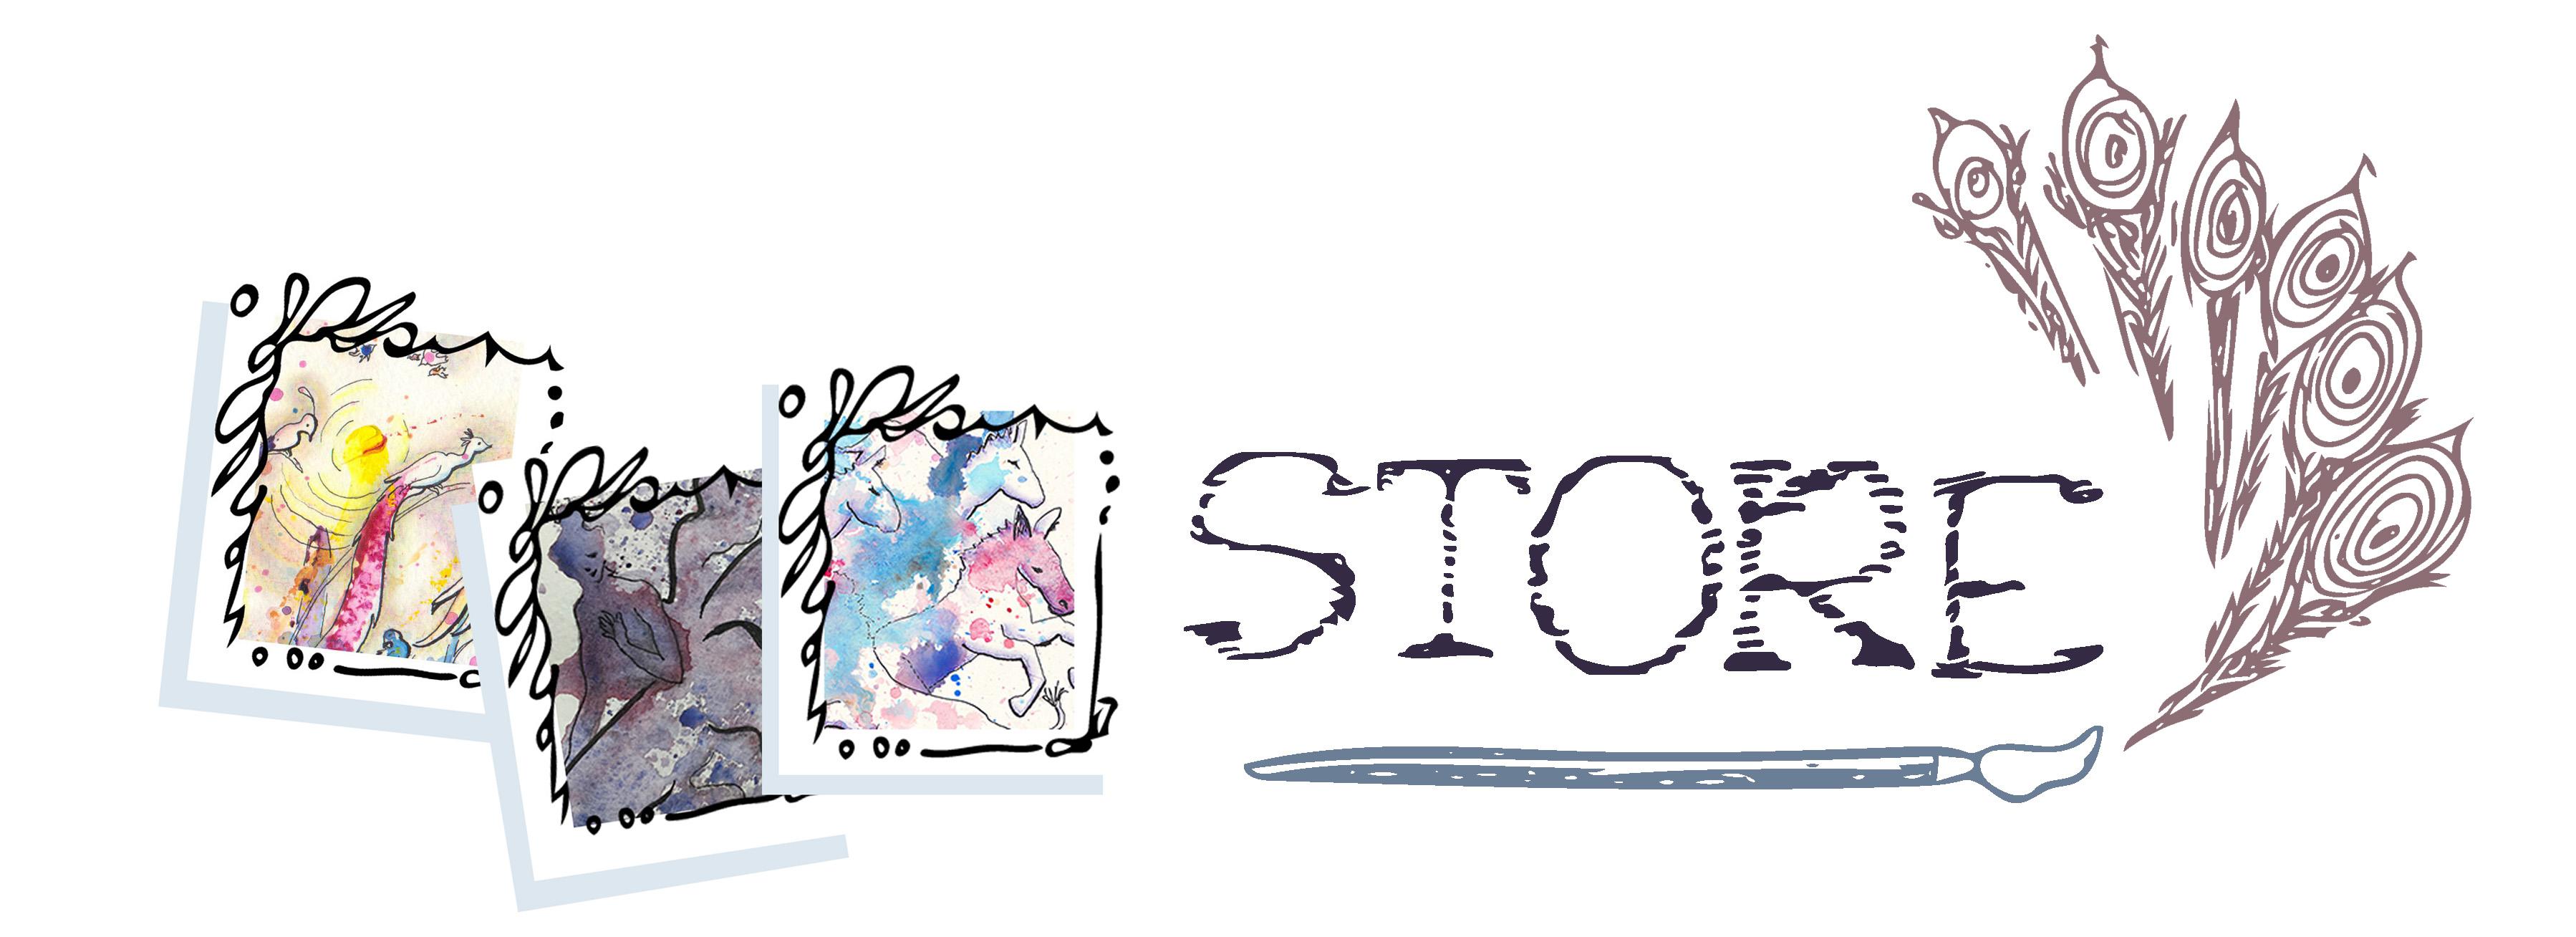 Web Store Illu